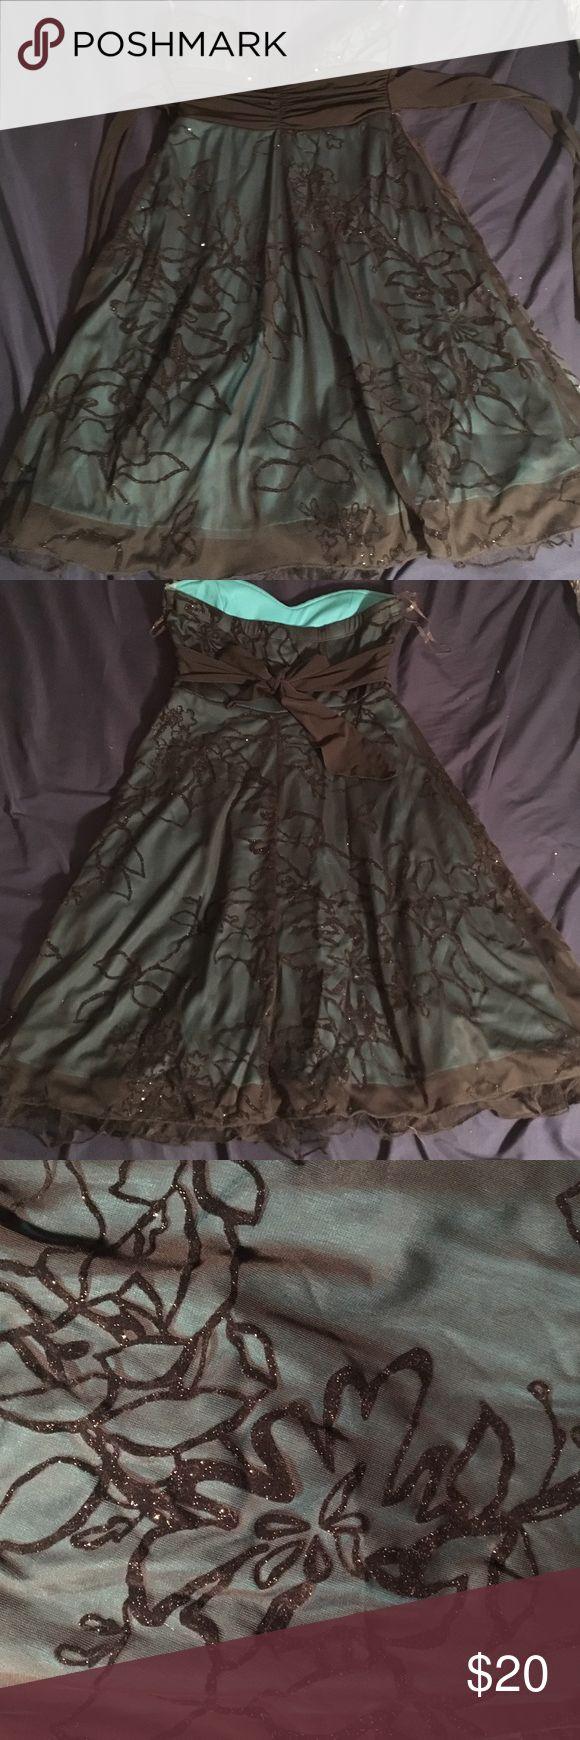 Strapless dress Black/teal strapless dress sparkly black pattern and tie under bust Dresses